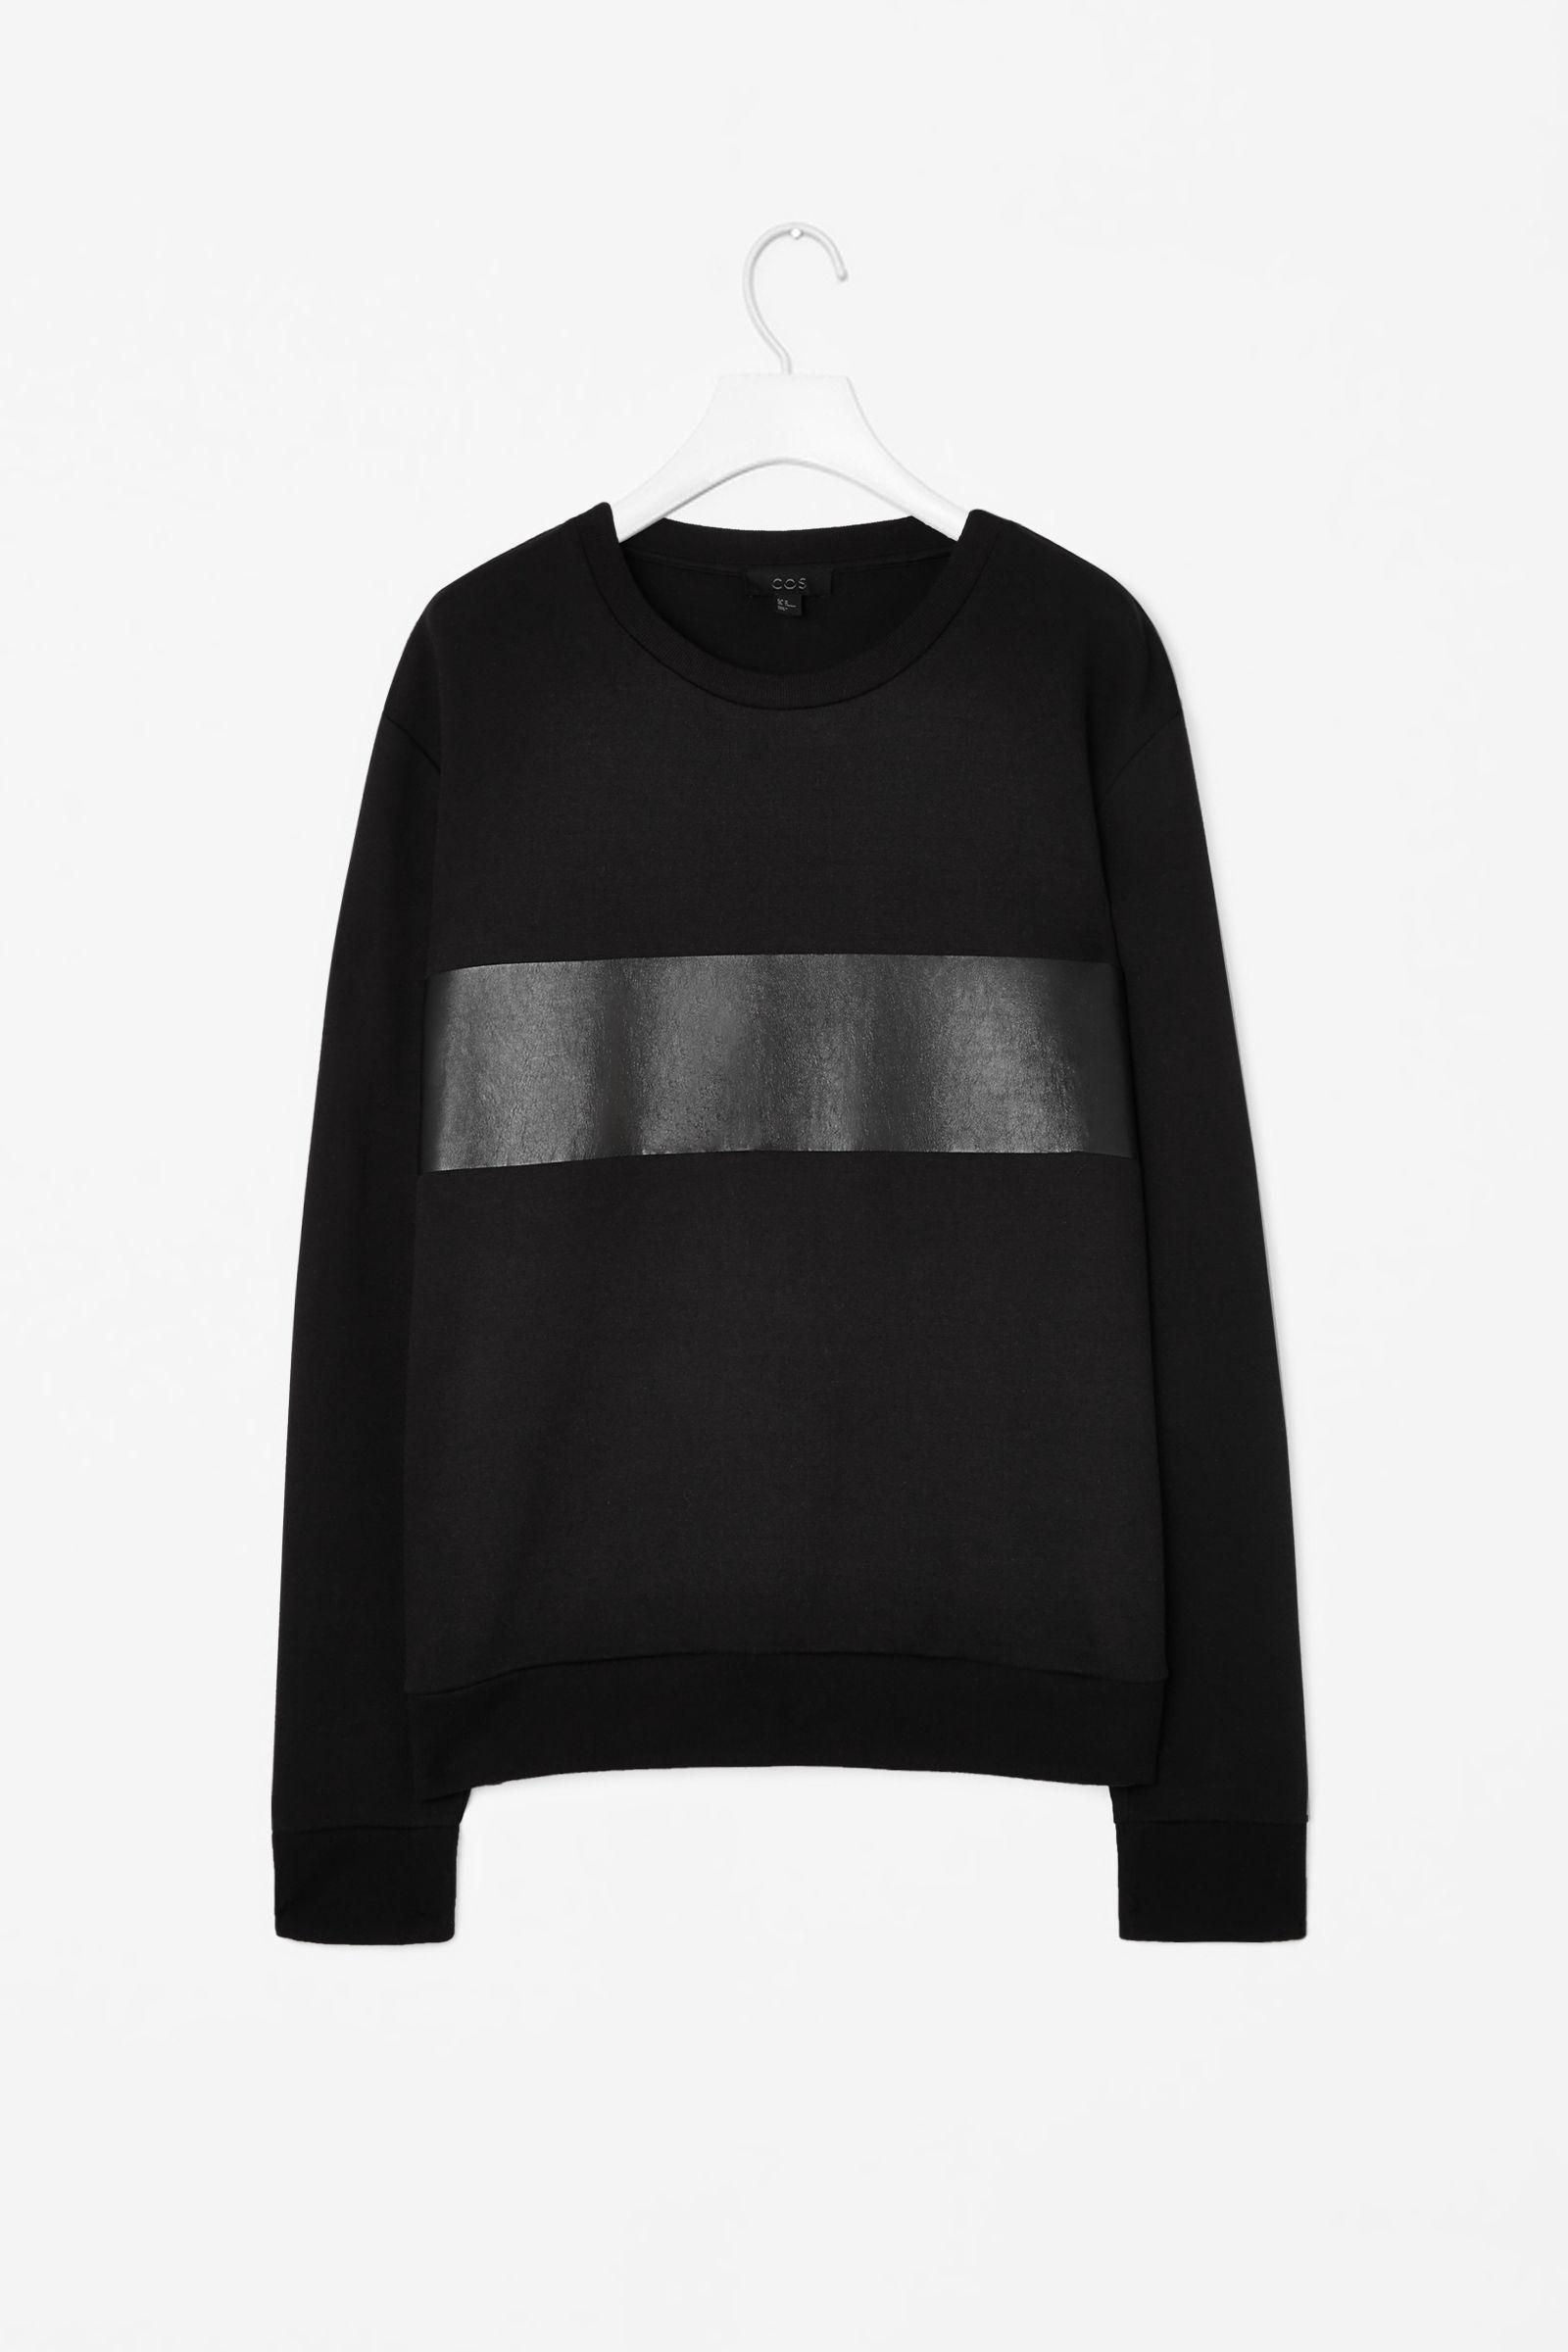 COS leather panel sweatshirt   MENS MOOD   Sweatshirts, Men sweater ... 01e8d2427b0